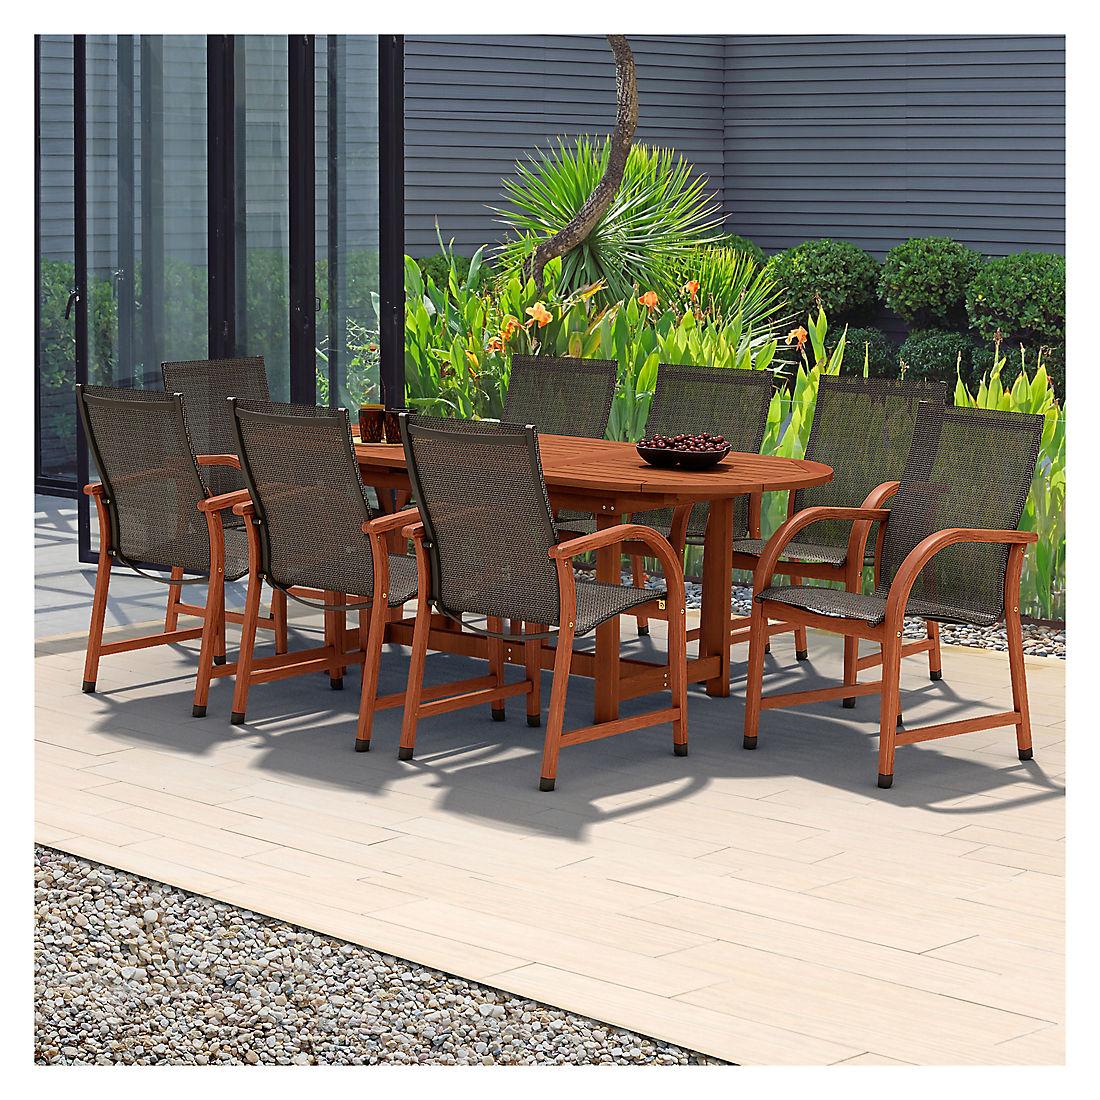 Amazonia Indiana 9 Pc Oval Eucalyptus Outdoor Dining Set Black Brown Bjs Wholesale Club